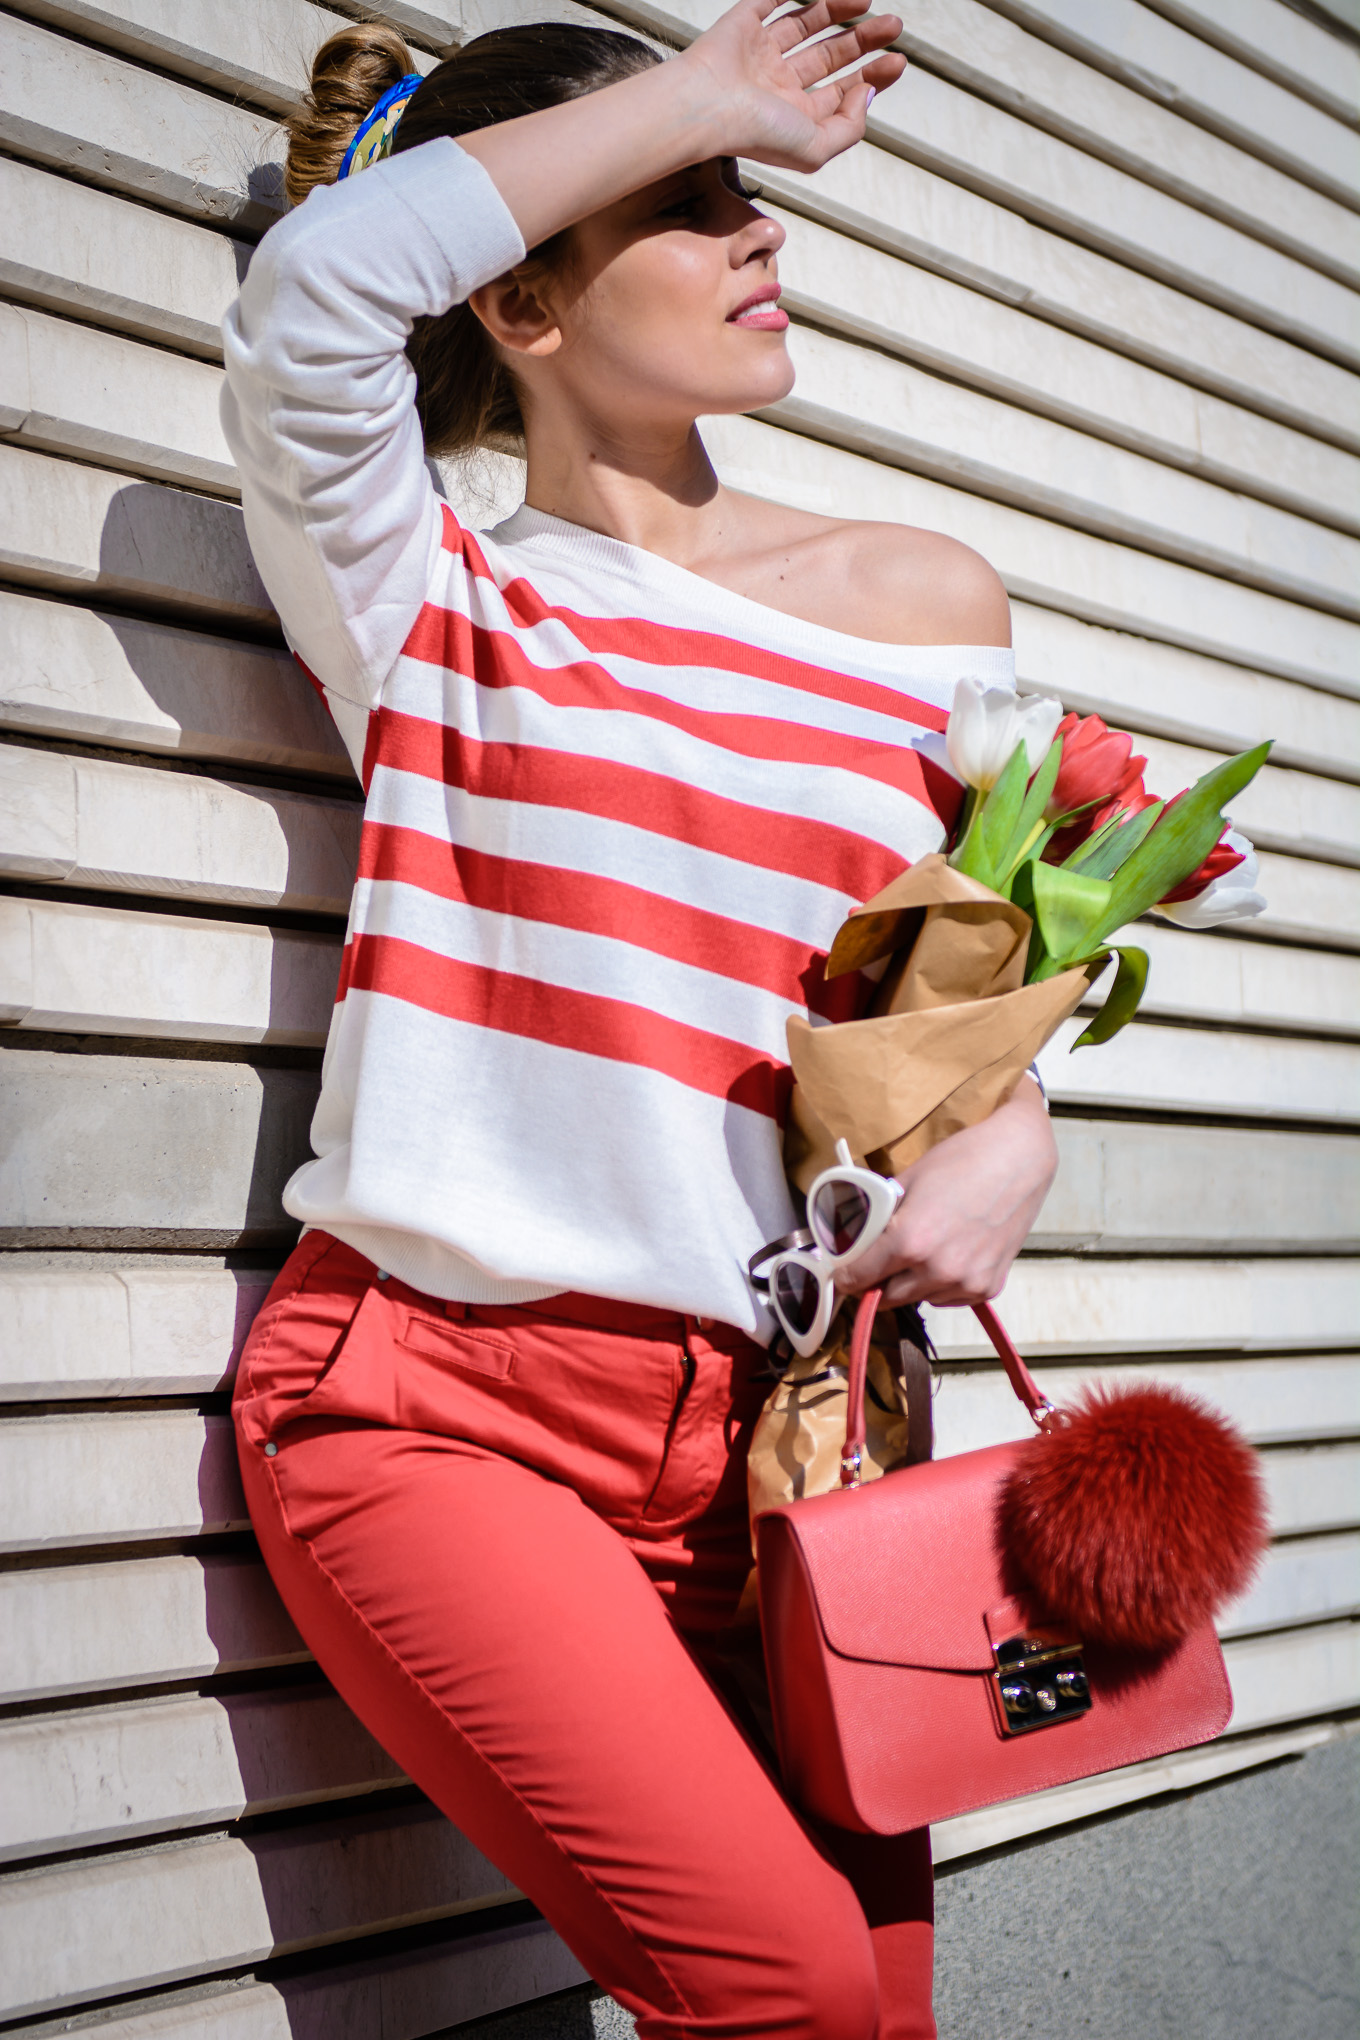 Bulgaria Mall fashion blogger